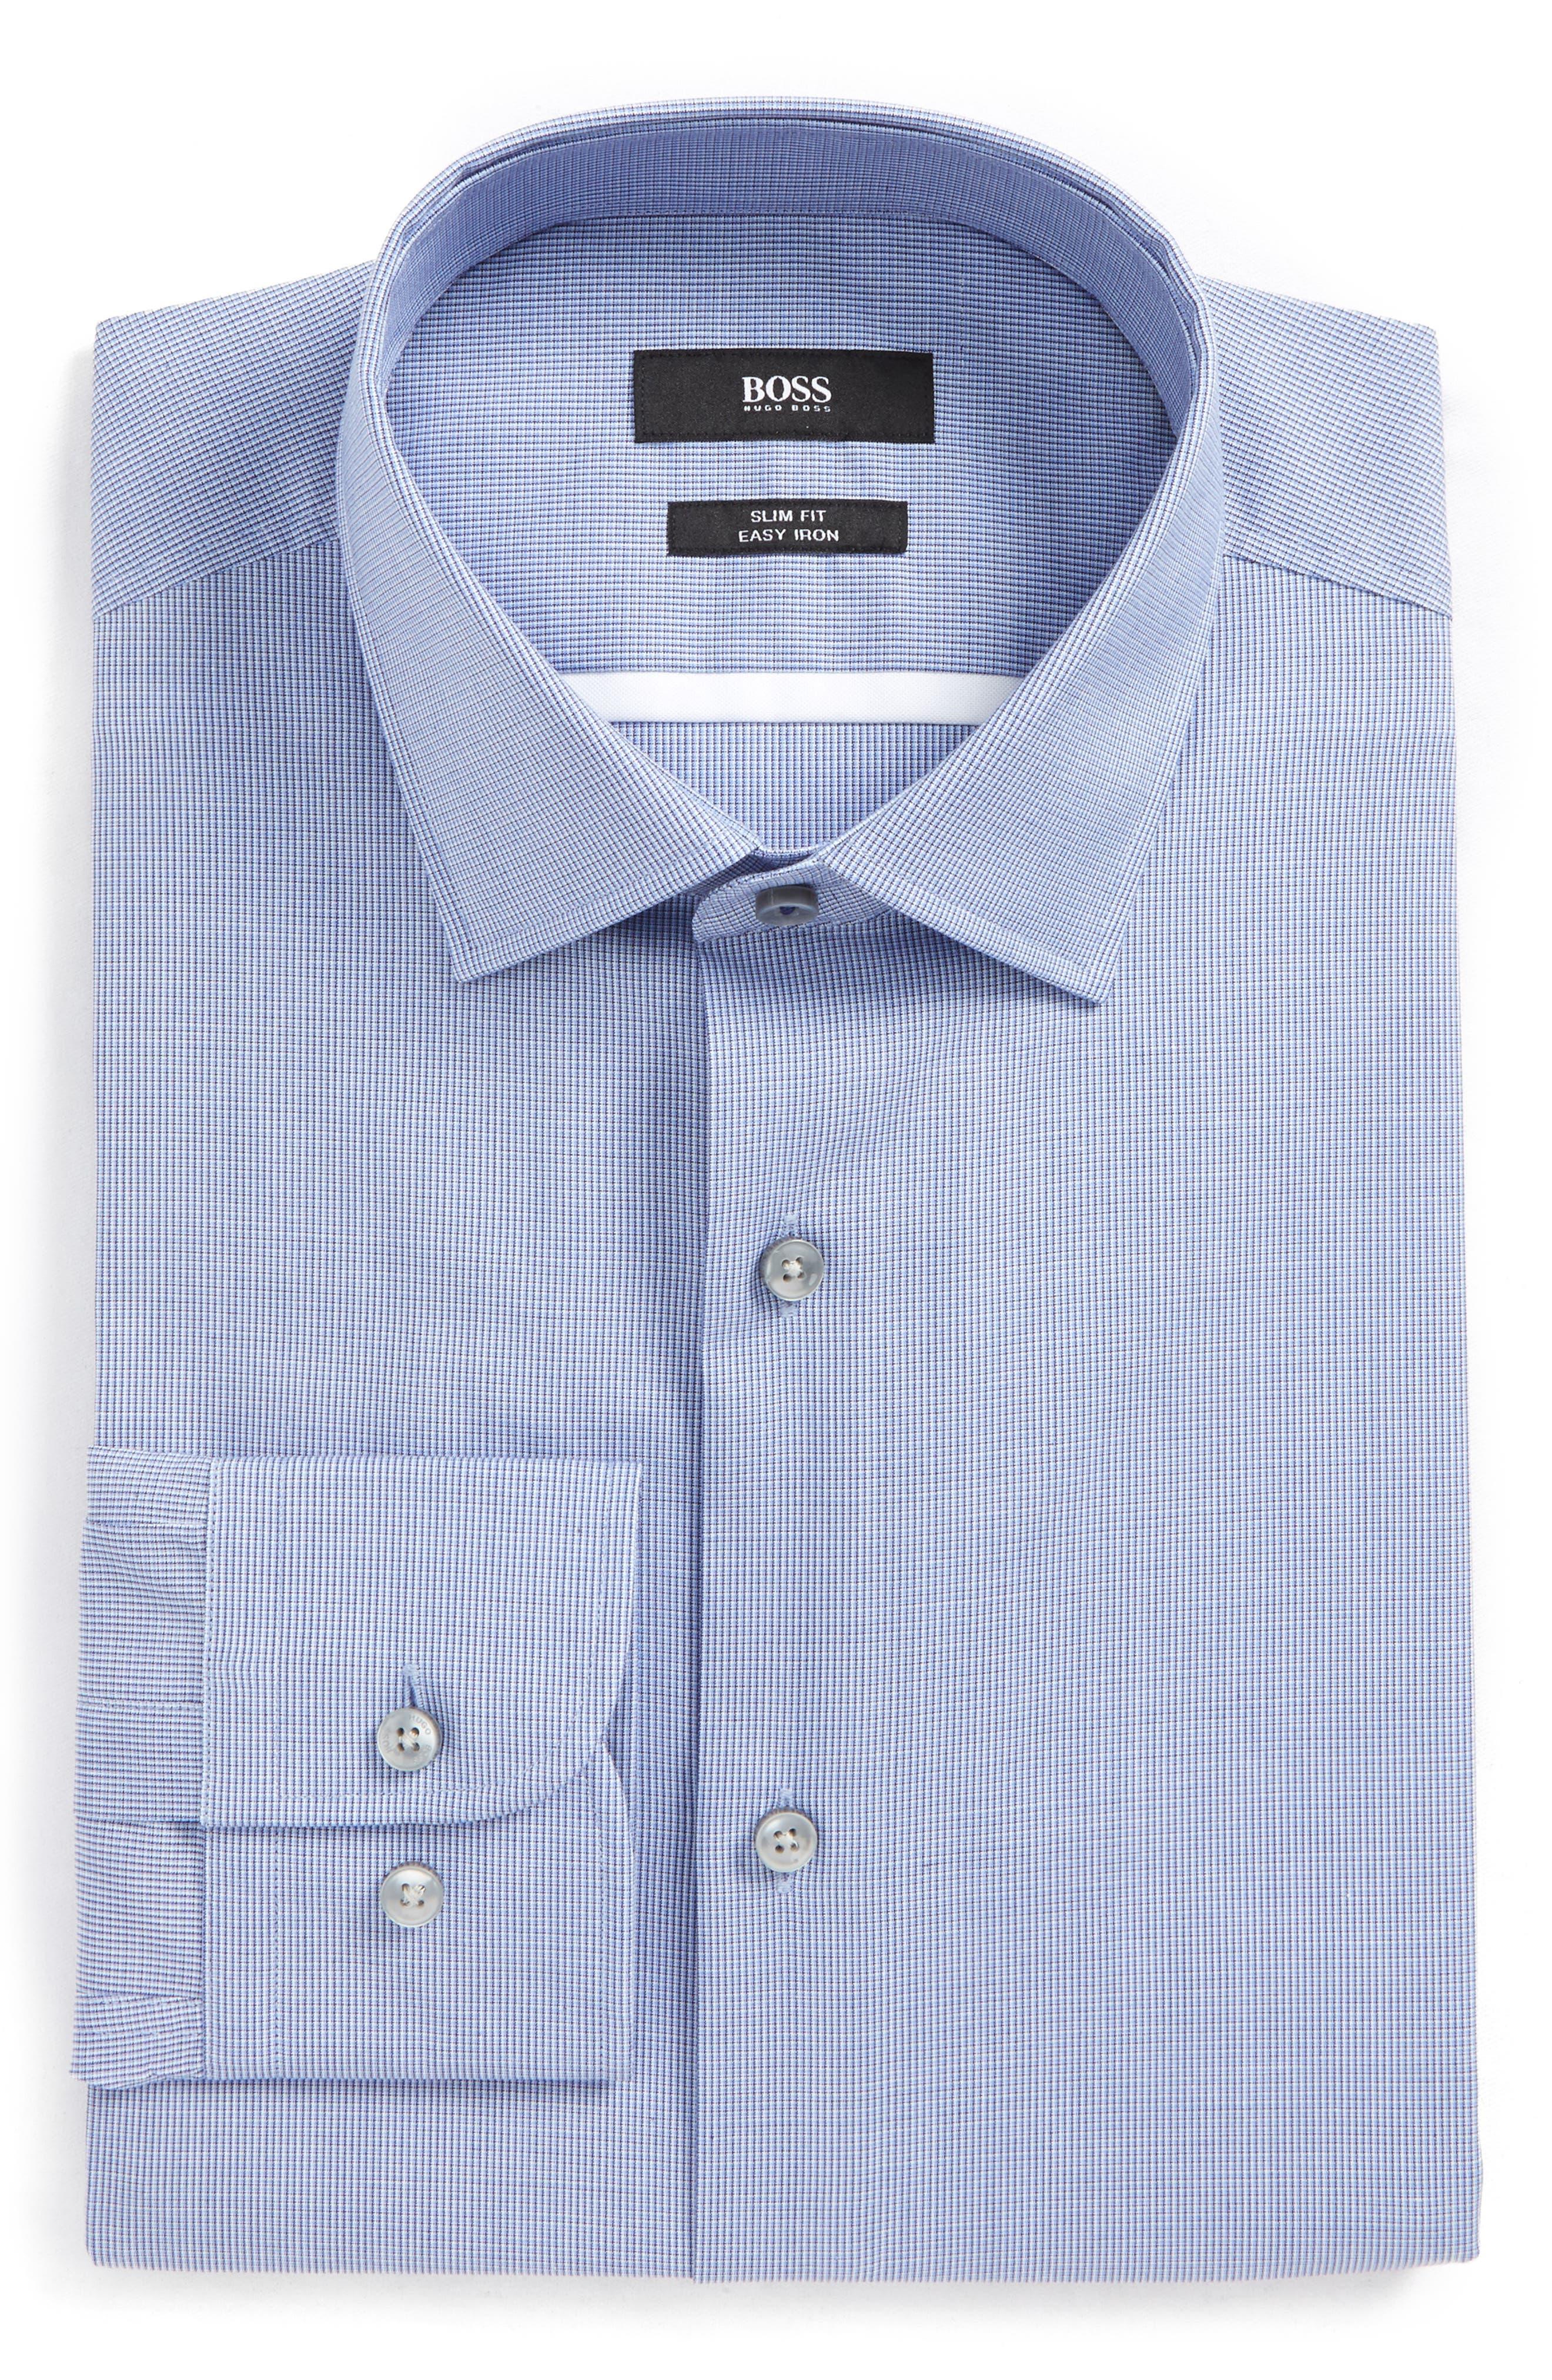 Jerris Slim Fit Easy Iron Check Dress Shirt,                             Alternate thumbnail 3, color,                             NAVY